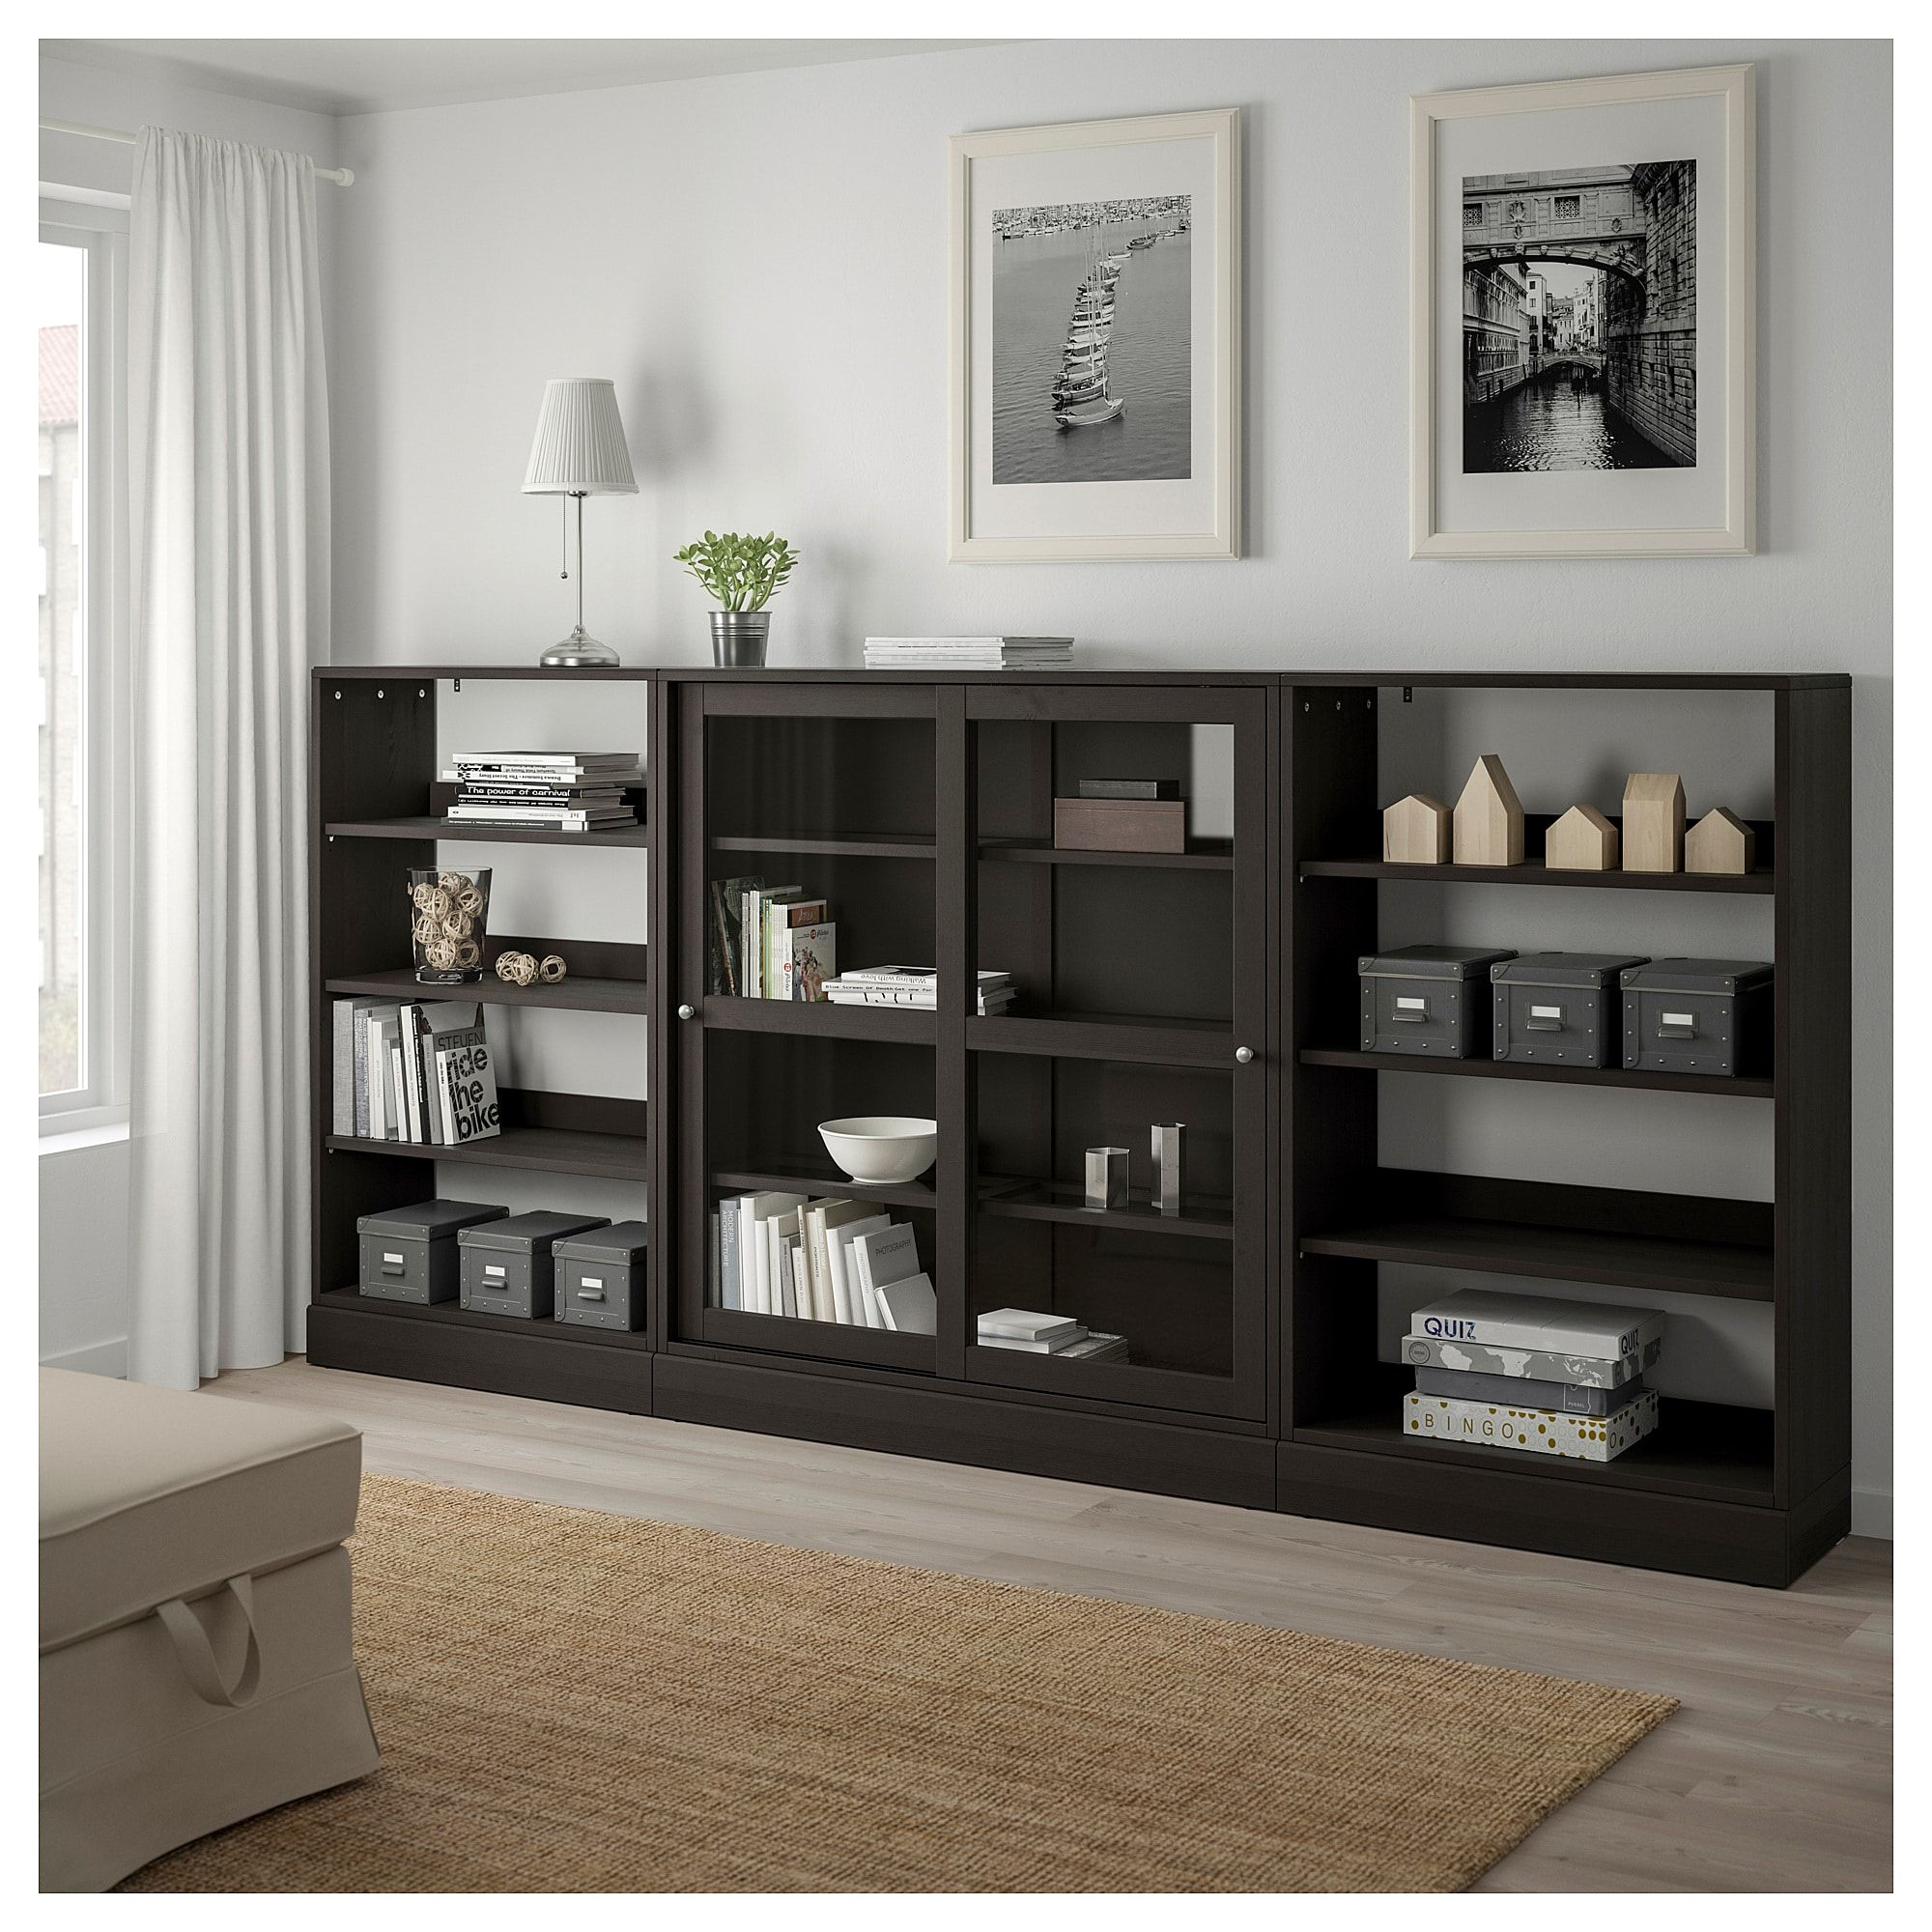 IKEA HAVSTA Storage with sliding glass doors dark brown